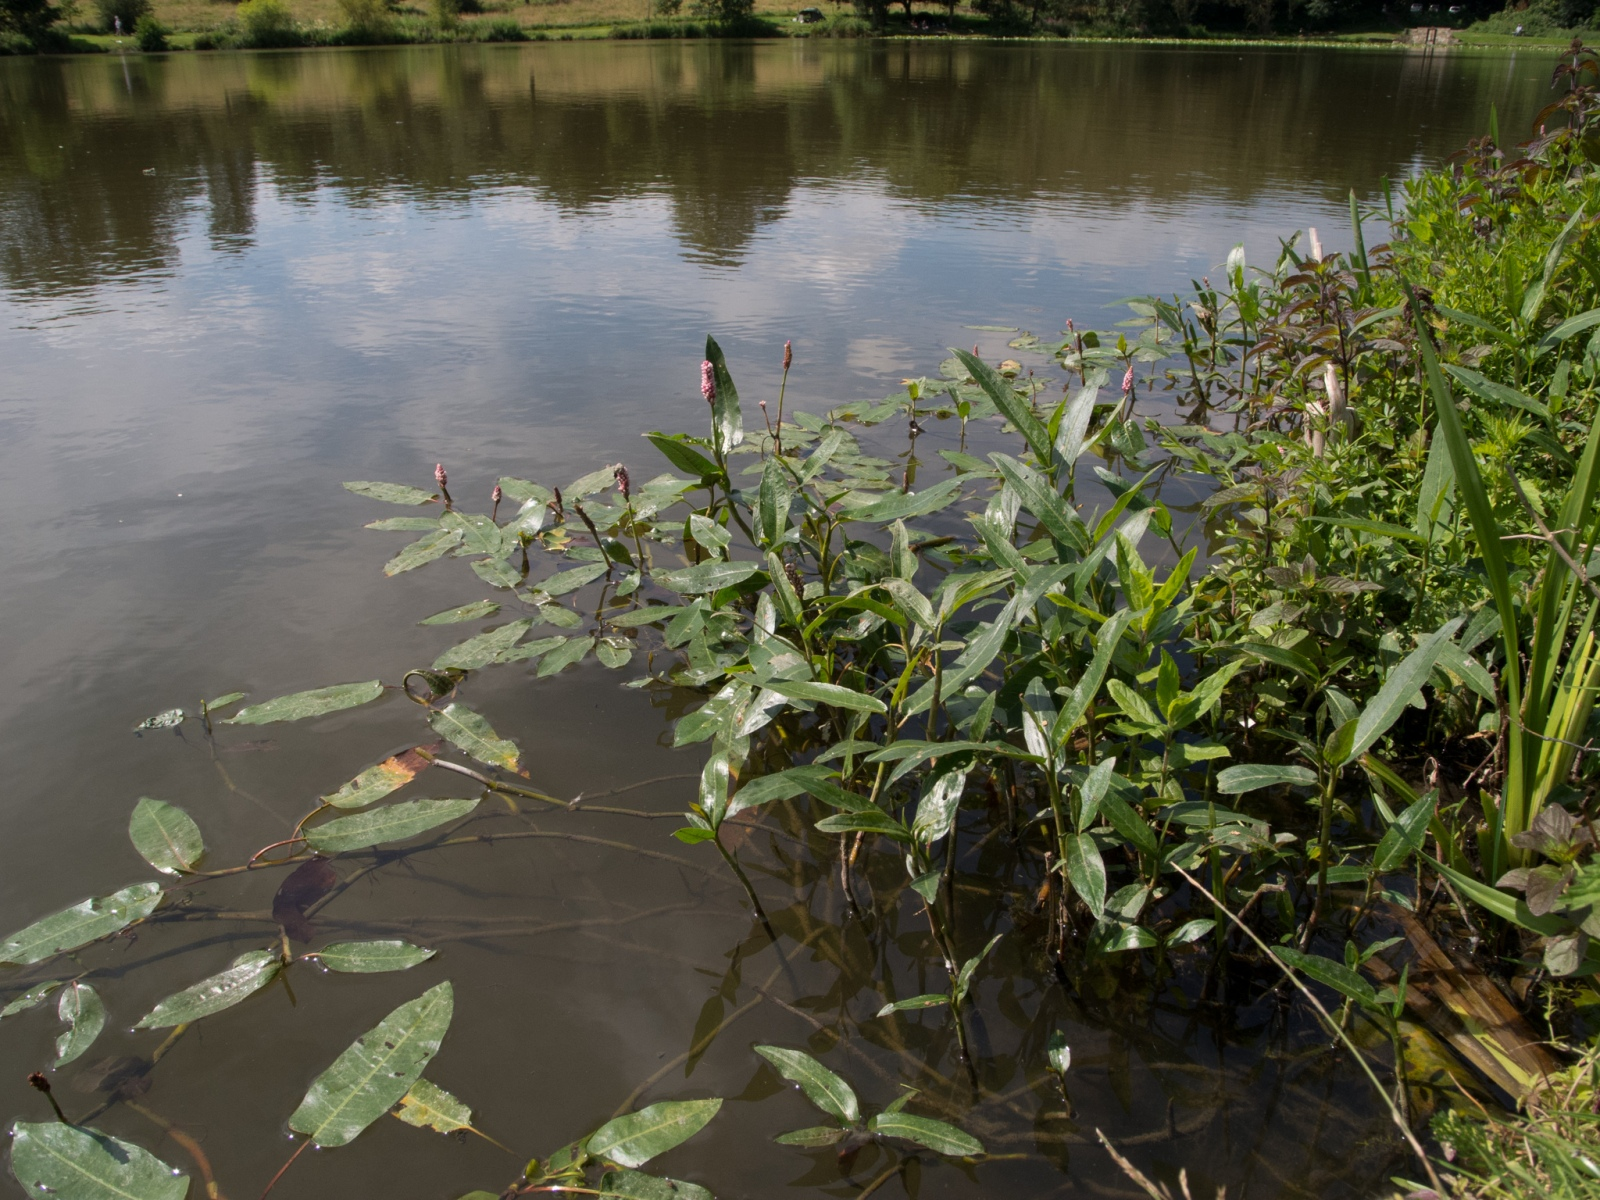 Amphibious Bistort (Persicaria amphibia), NT Hardwick, Derbyshire.